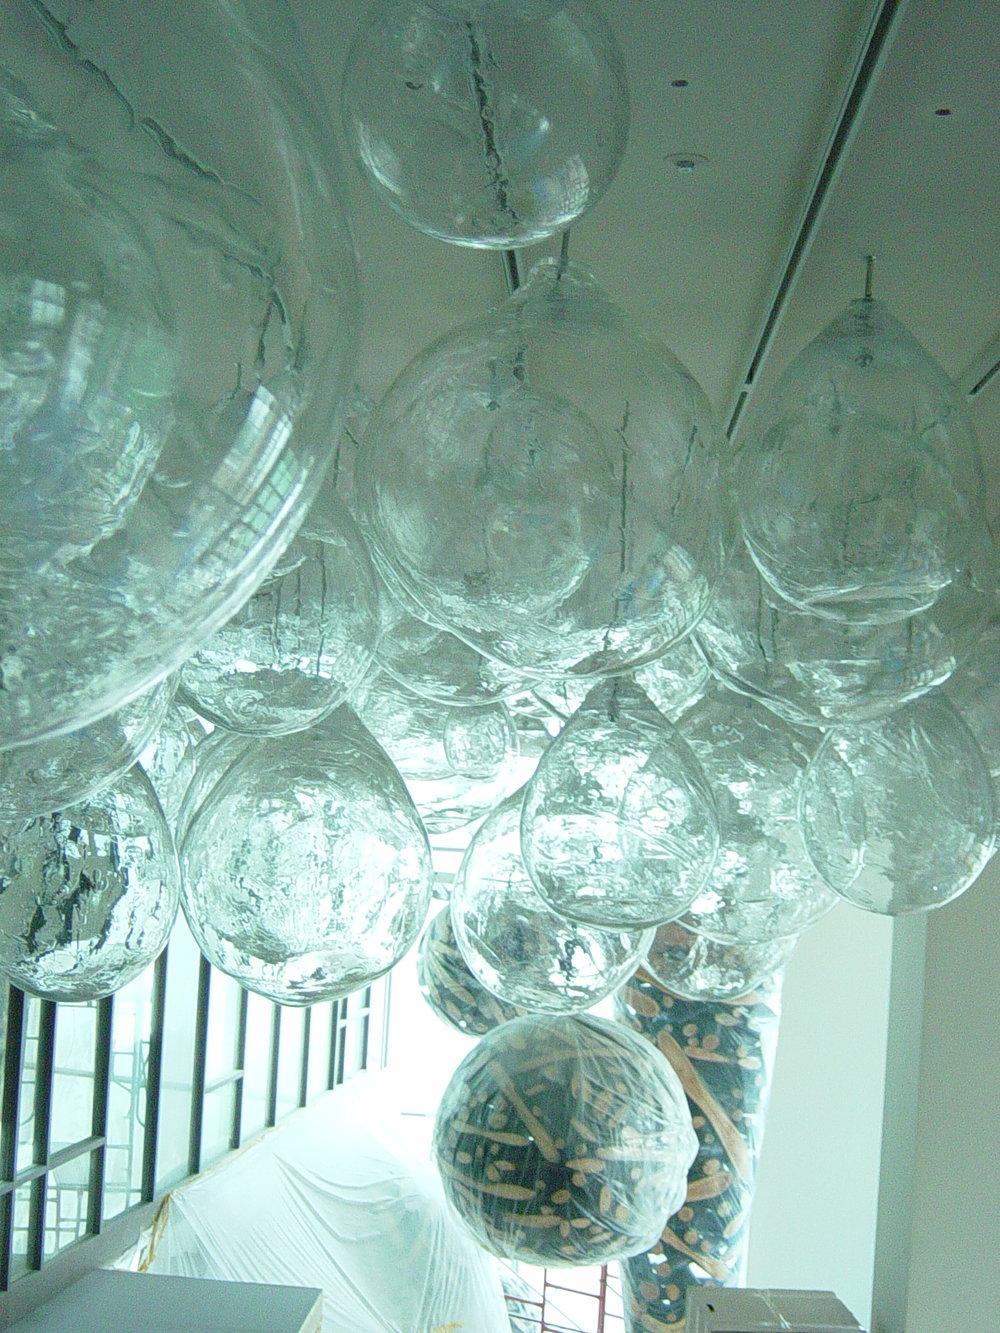 sei+studio+custom+glass+design+nyc+w+hotel+seoul+11.JPG